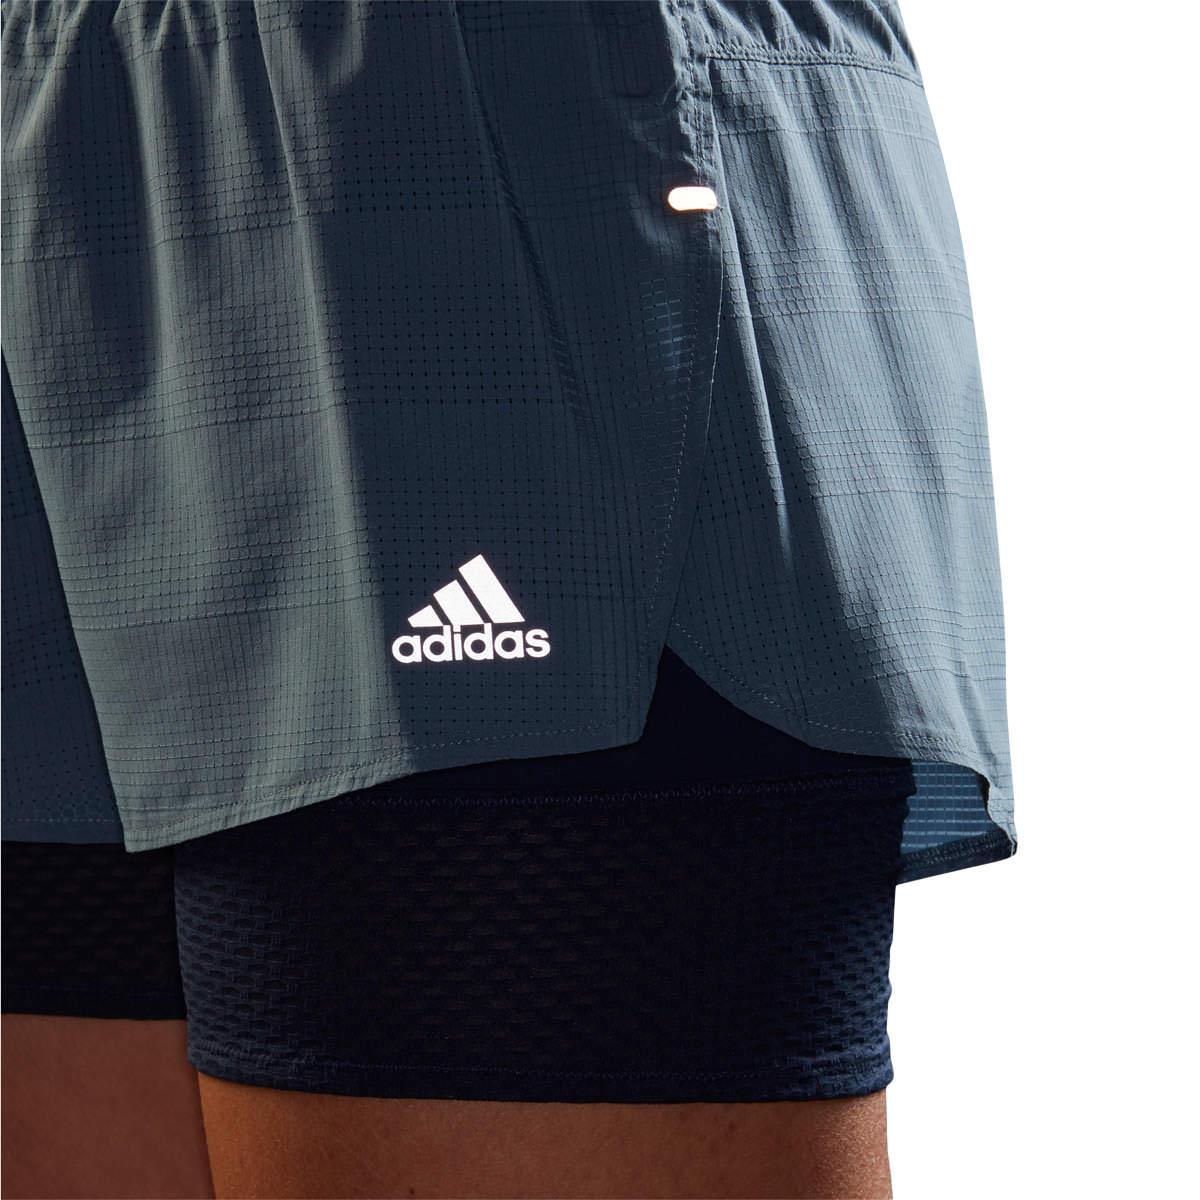 adidas Heat Ready Løbeshorts Dame